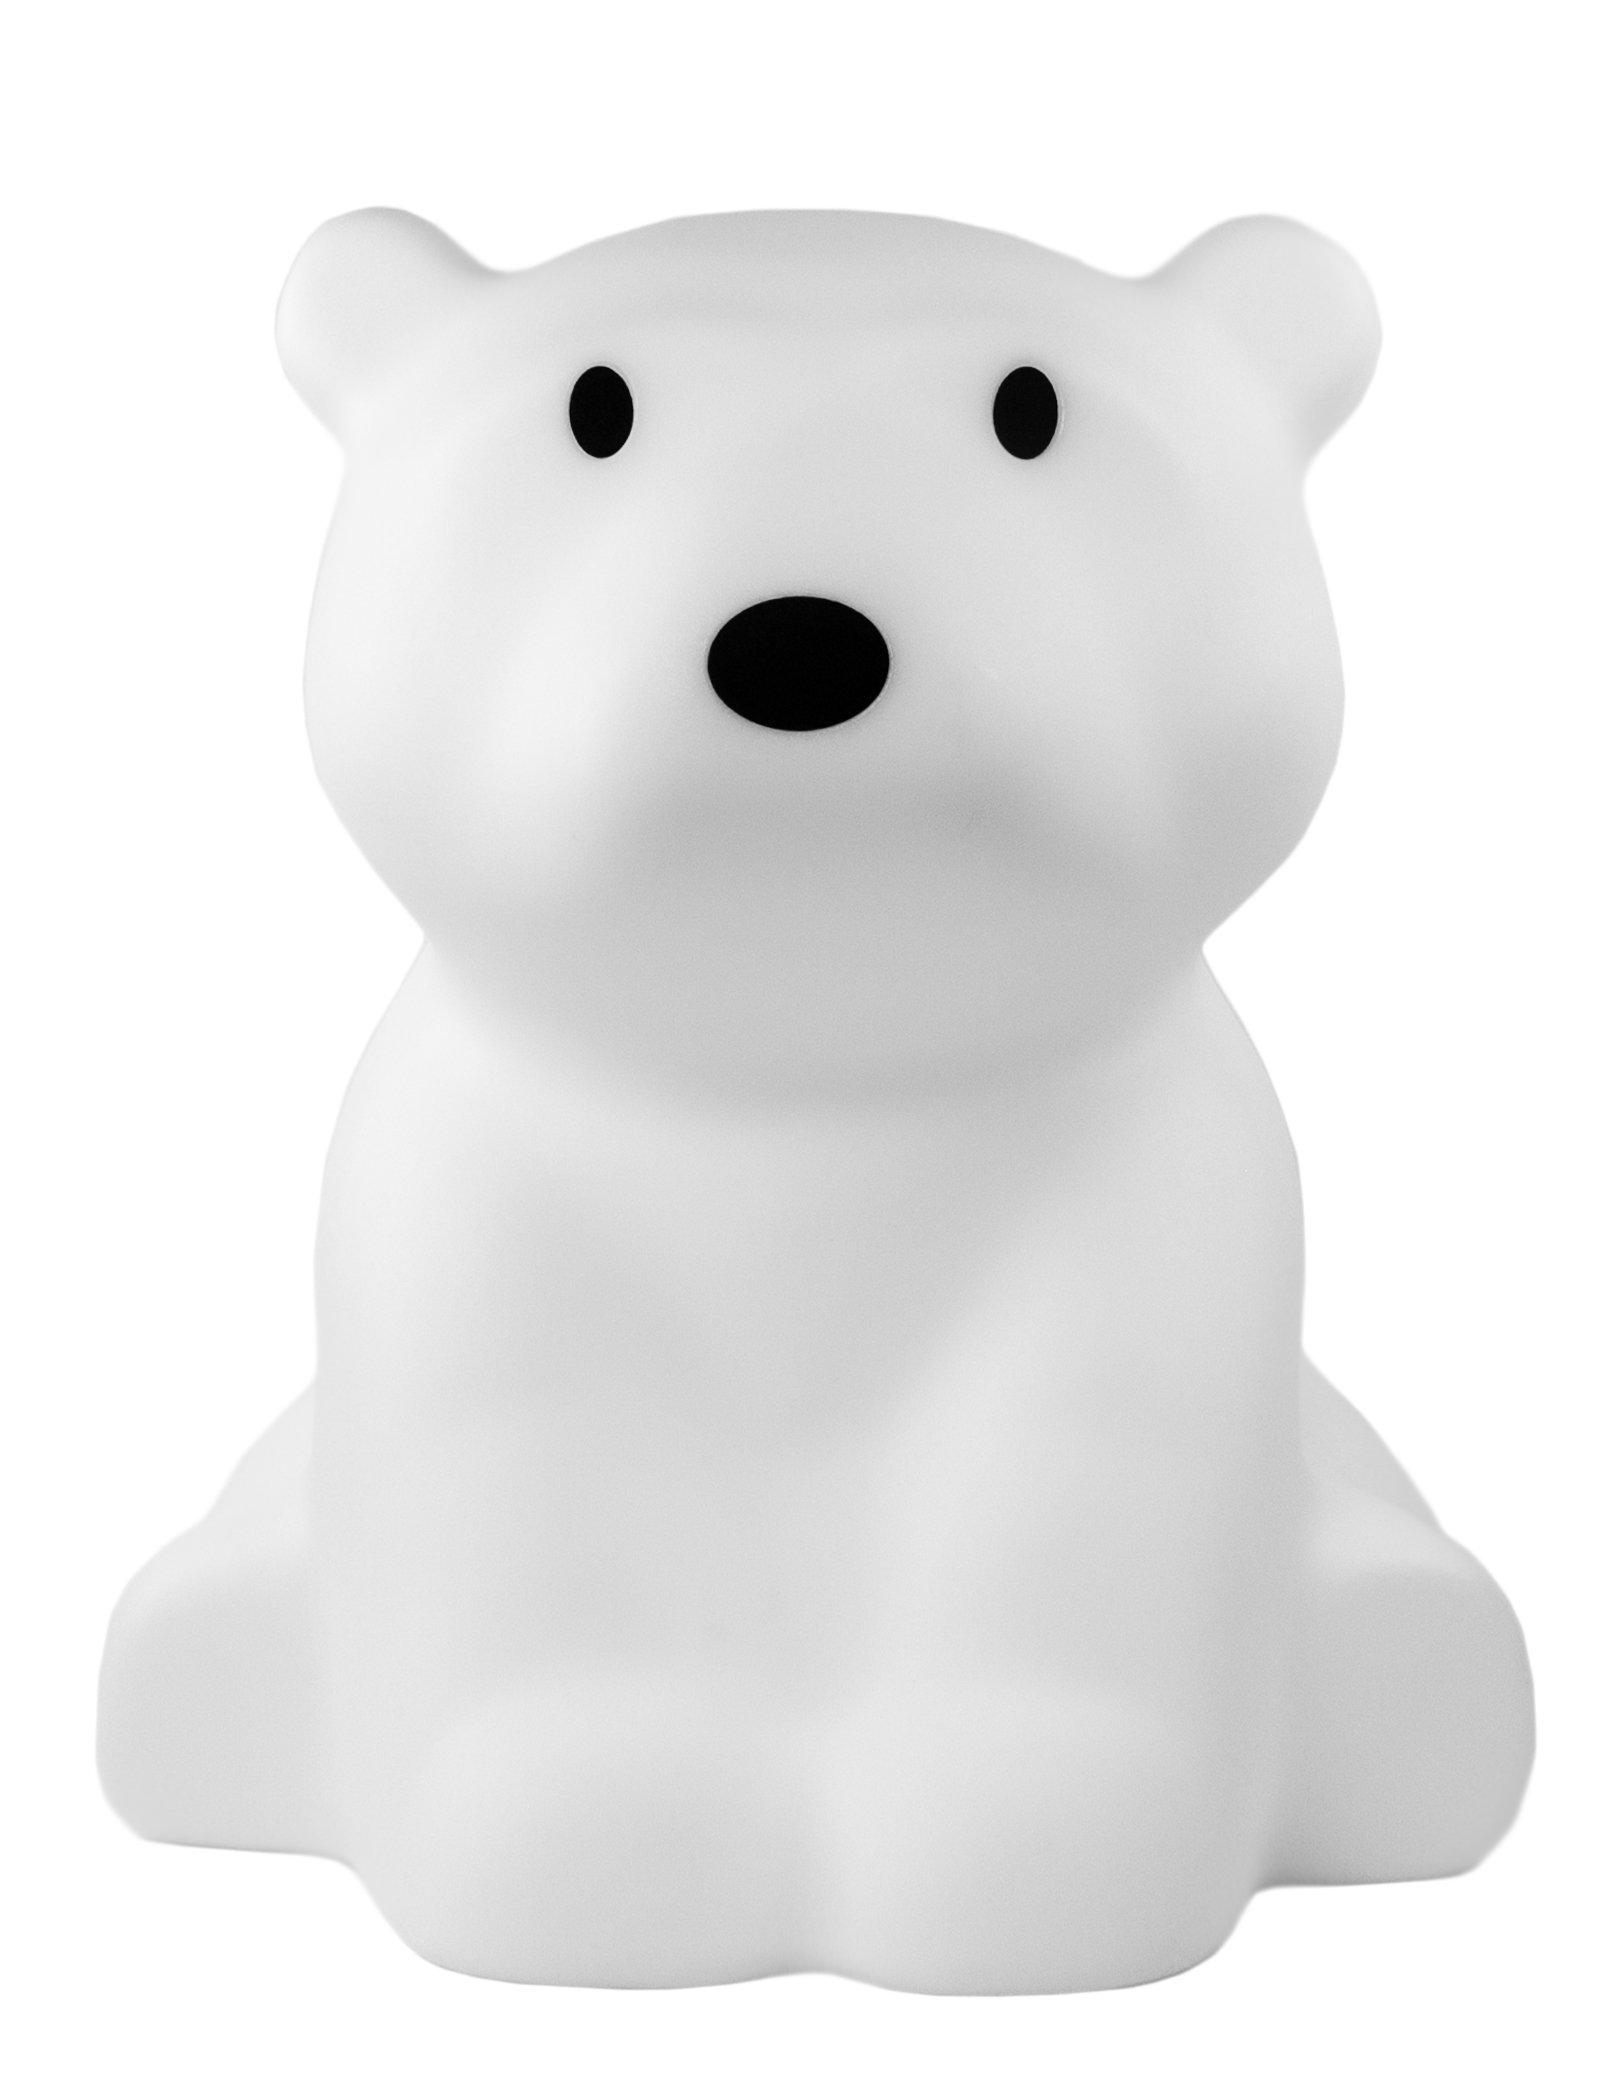 White LED Soft Glow Nanuk Polar Bear Lamp with Dimmer, 16 Inches Tall by Nanuk Bear